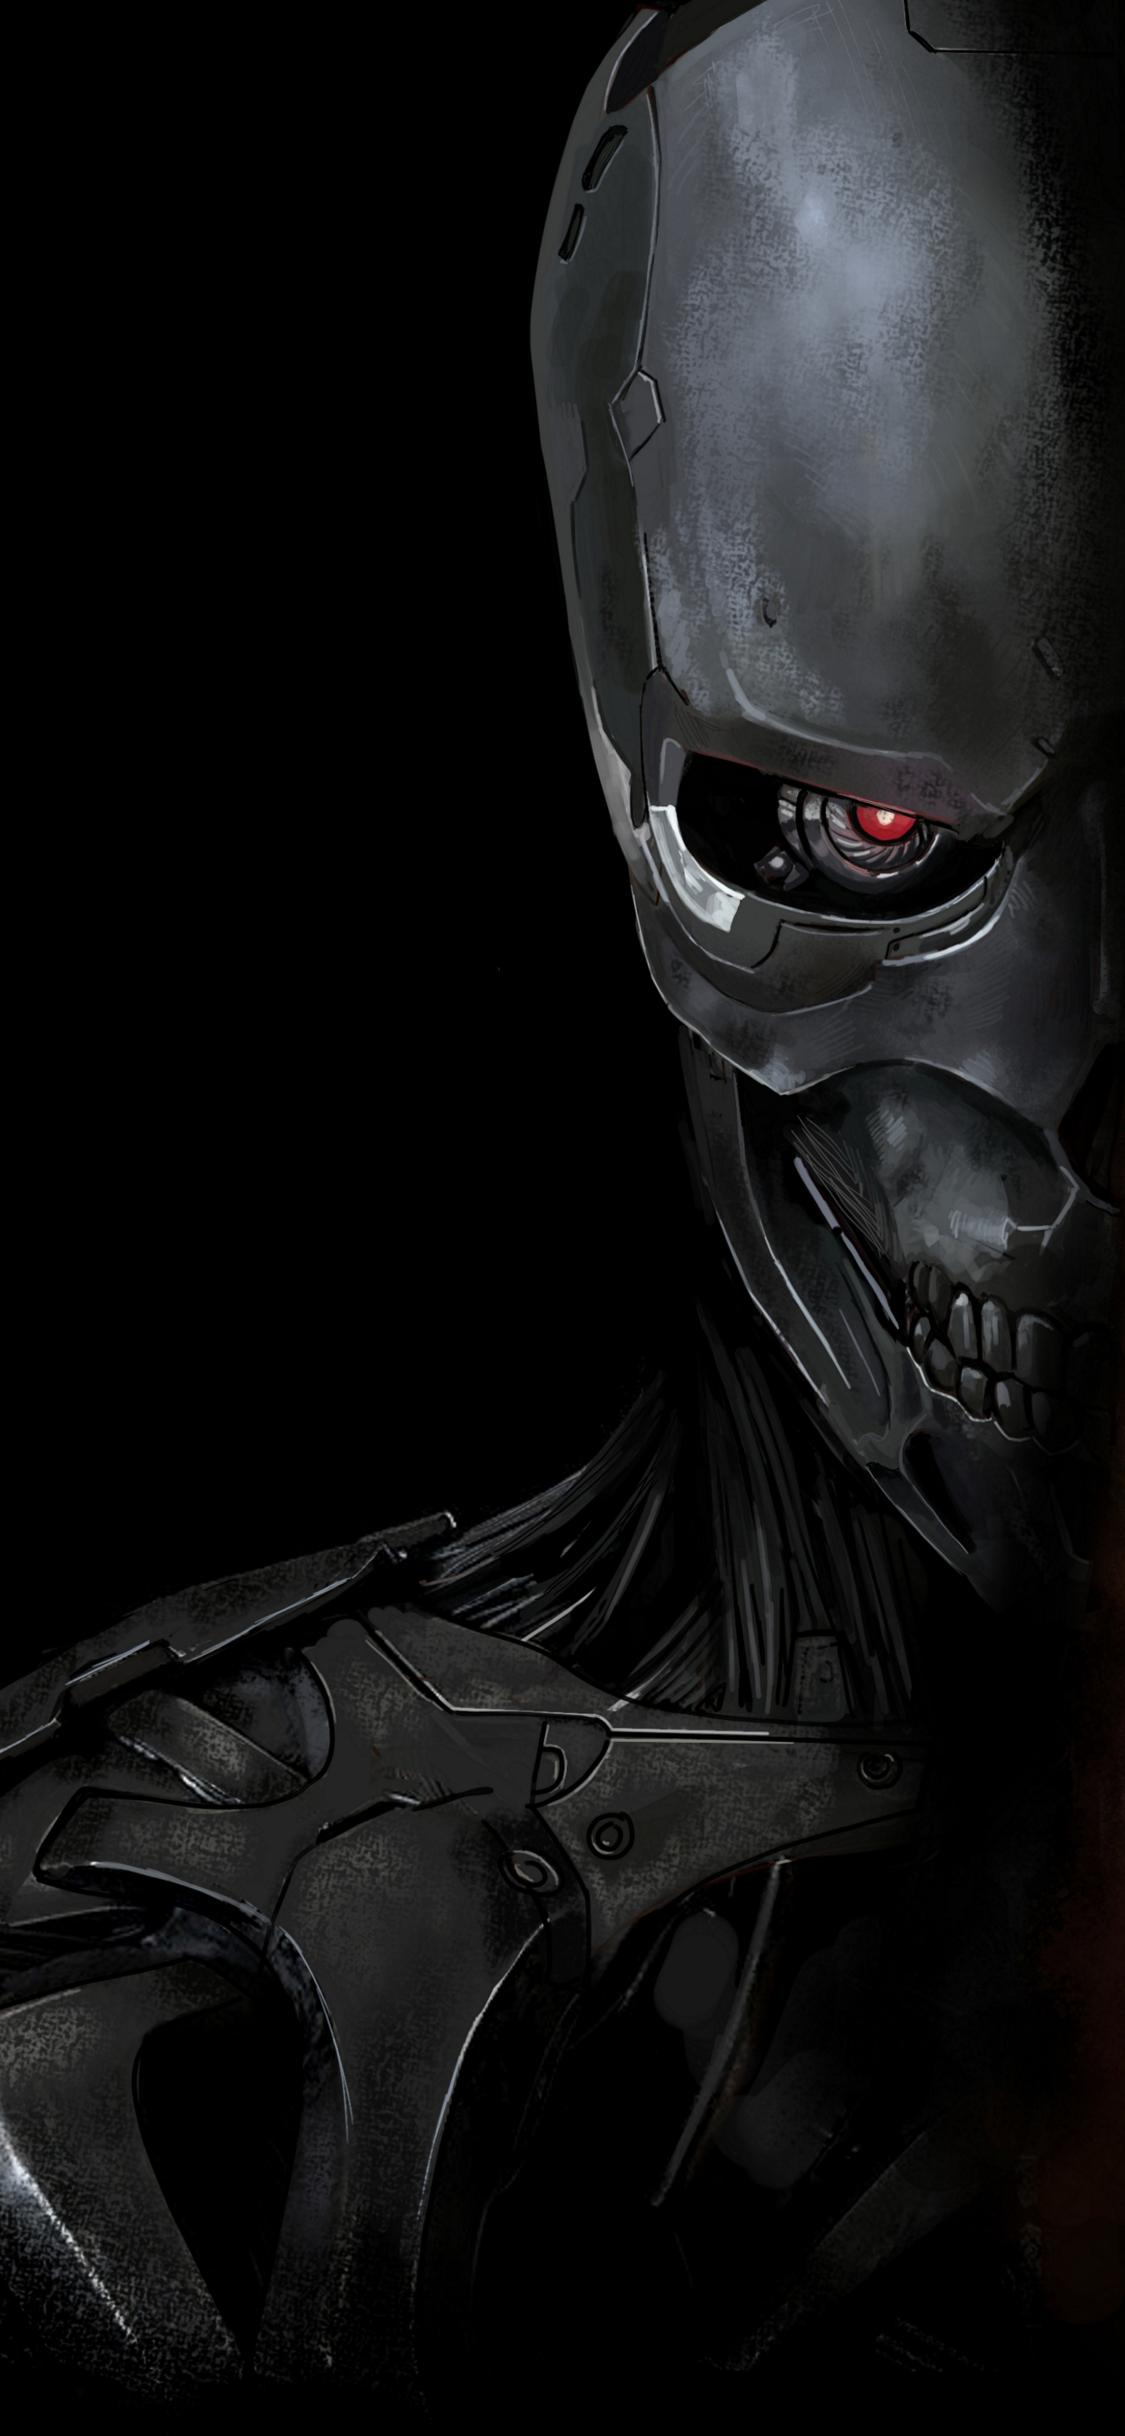 Terminator Cobra Iphone Wallpaper